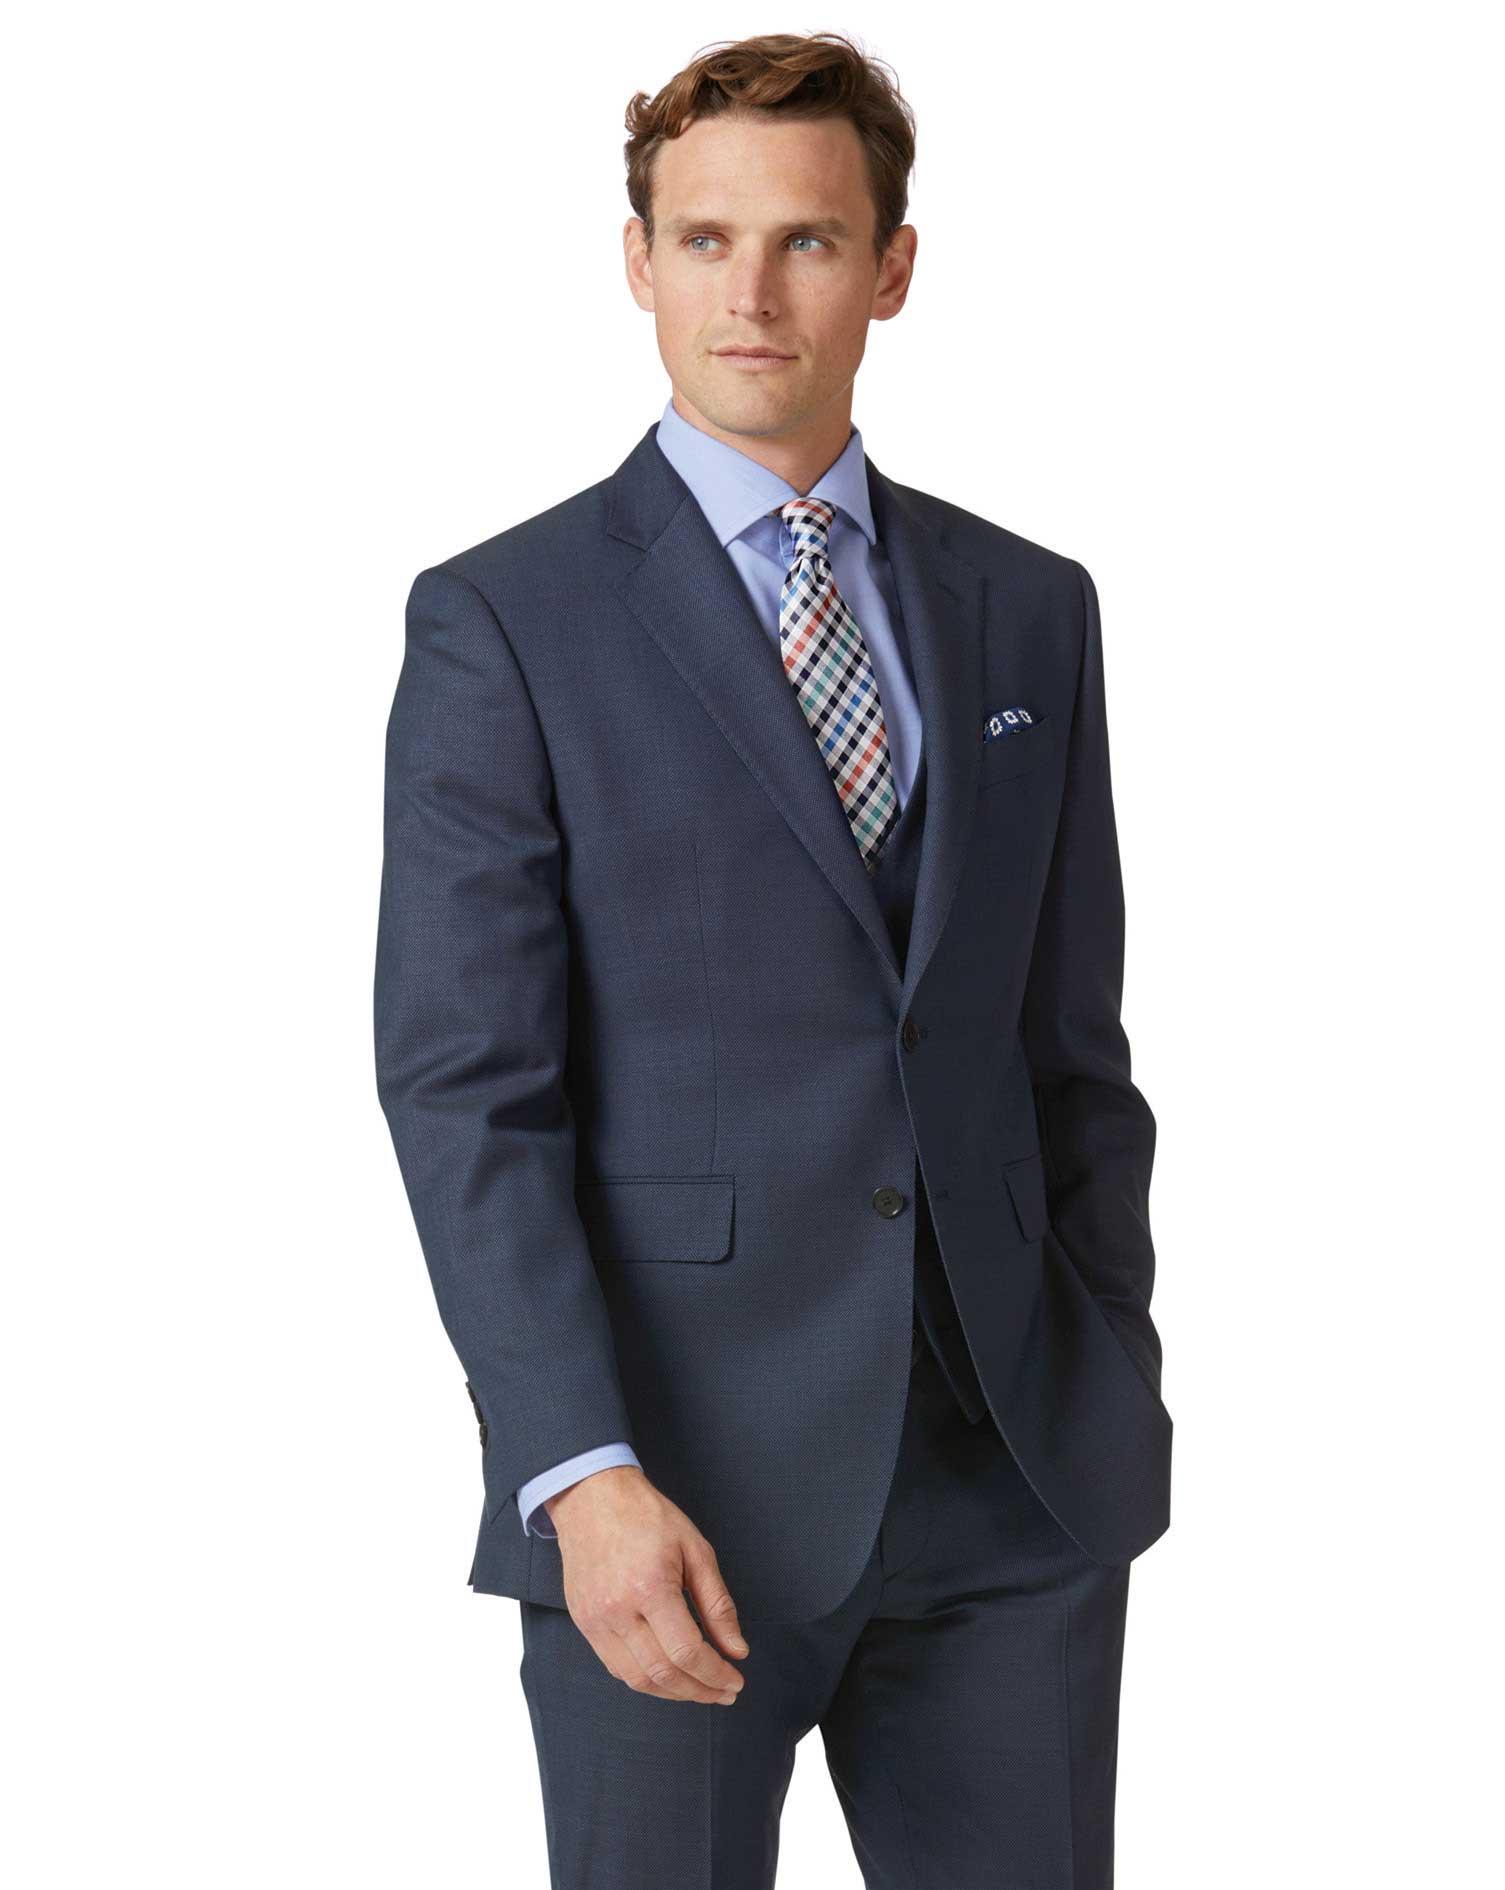 Airforce Blue Slim Fit Birdseye Travel Suit Wool Jacket Size 46 Regular by Charles Tyrwhitt